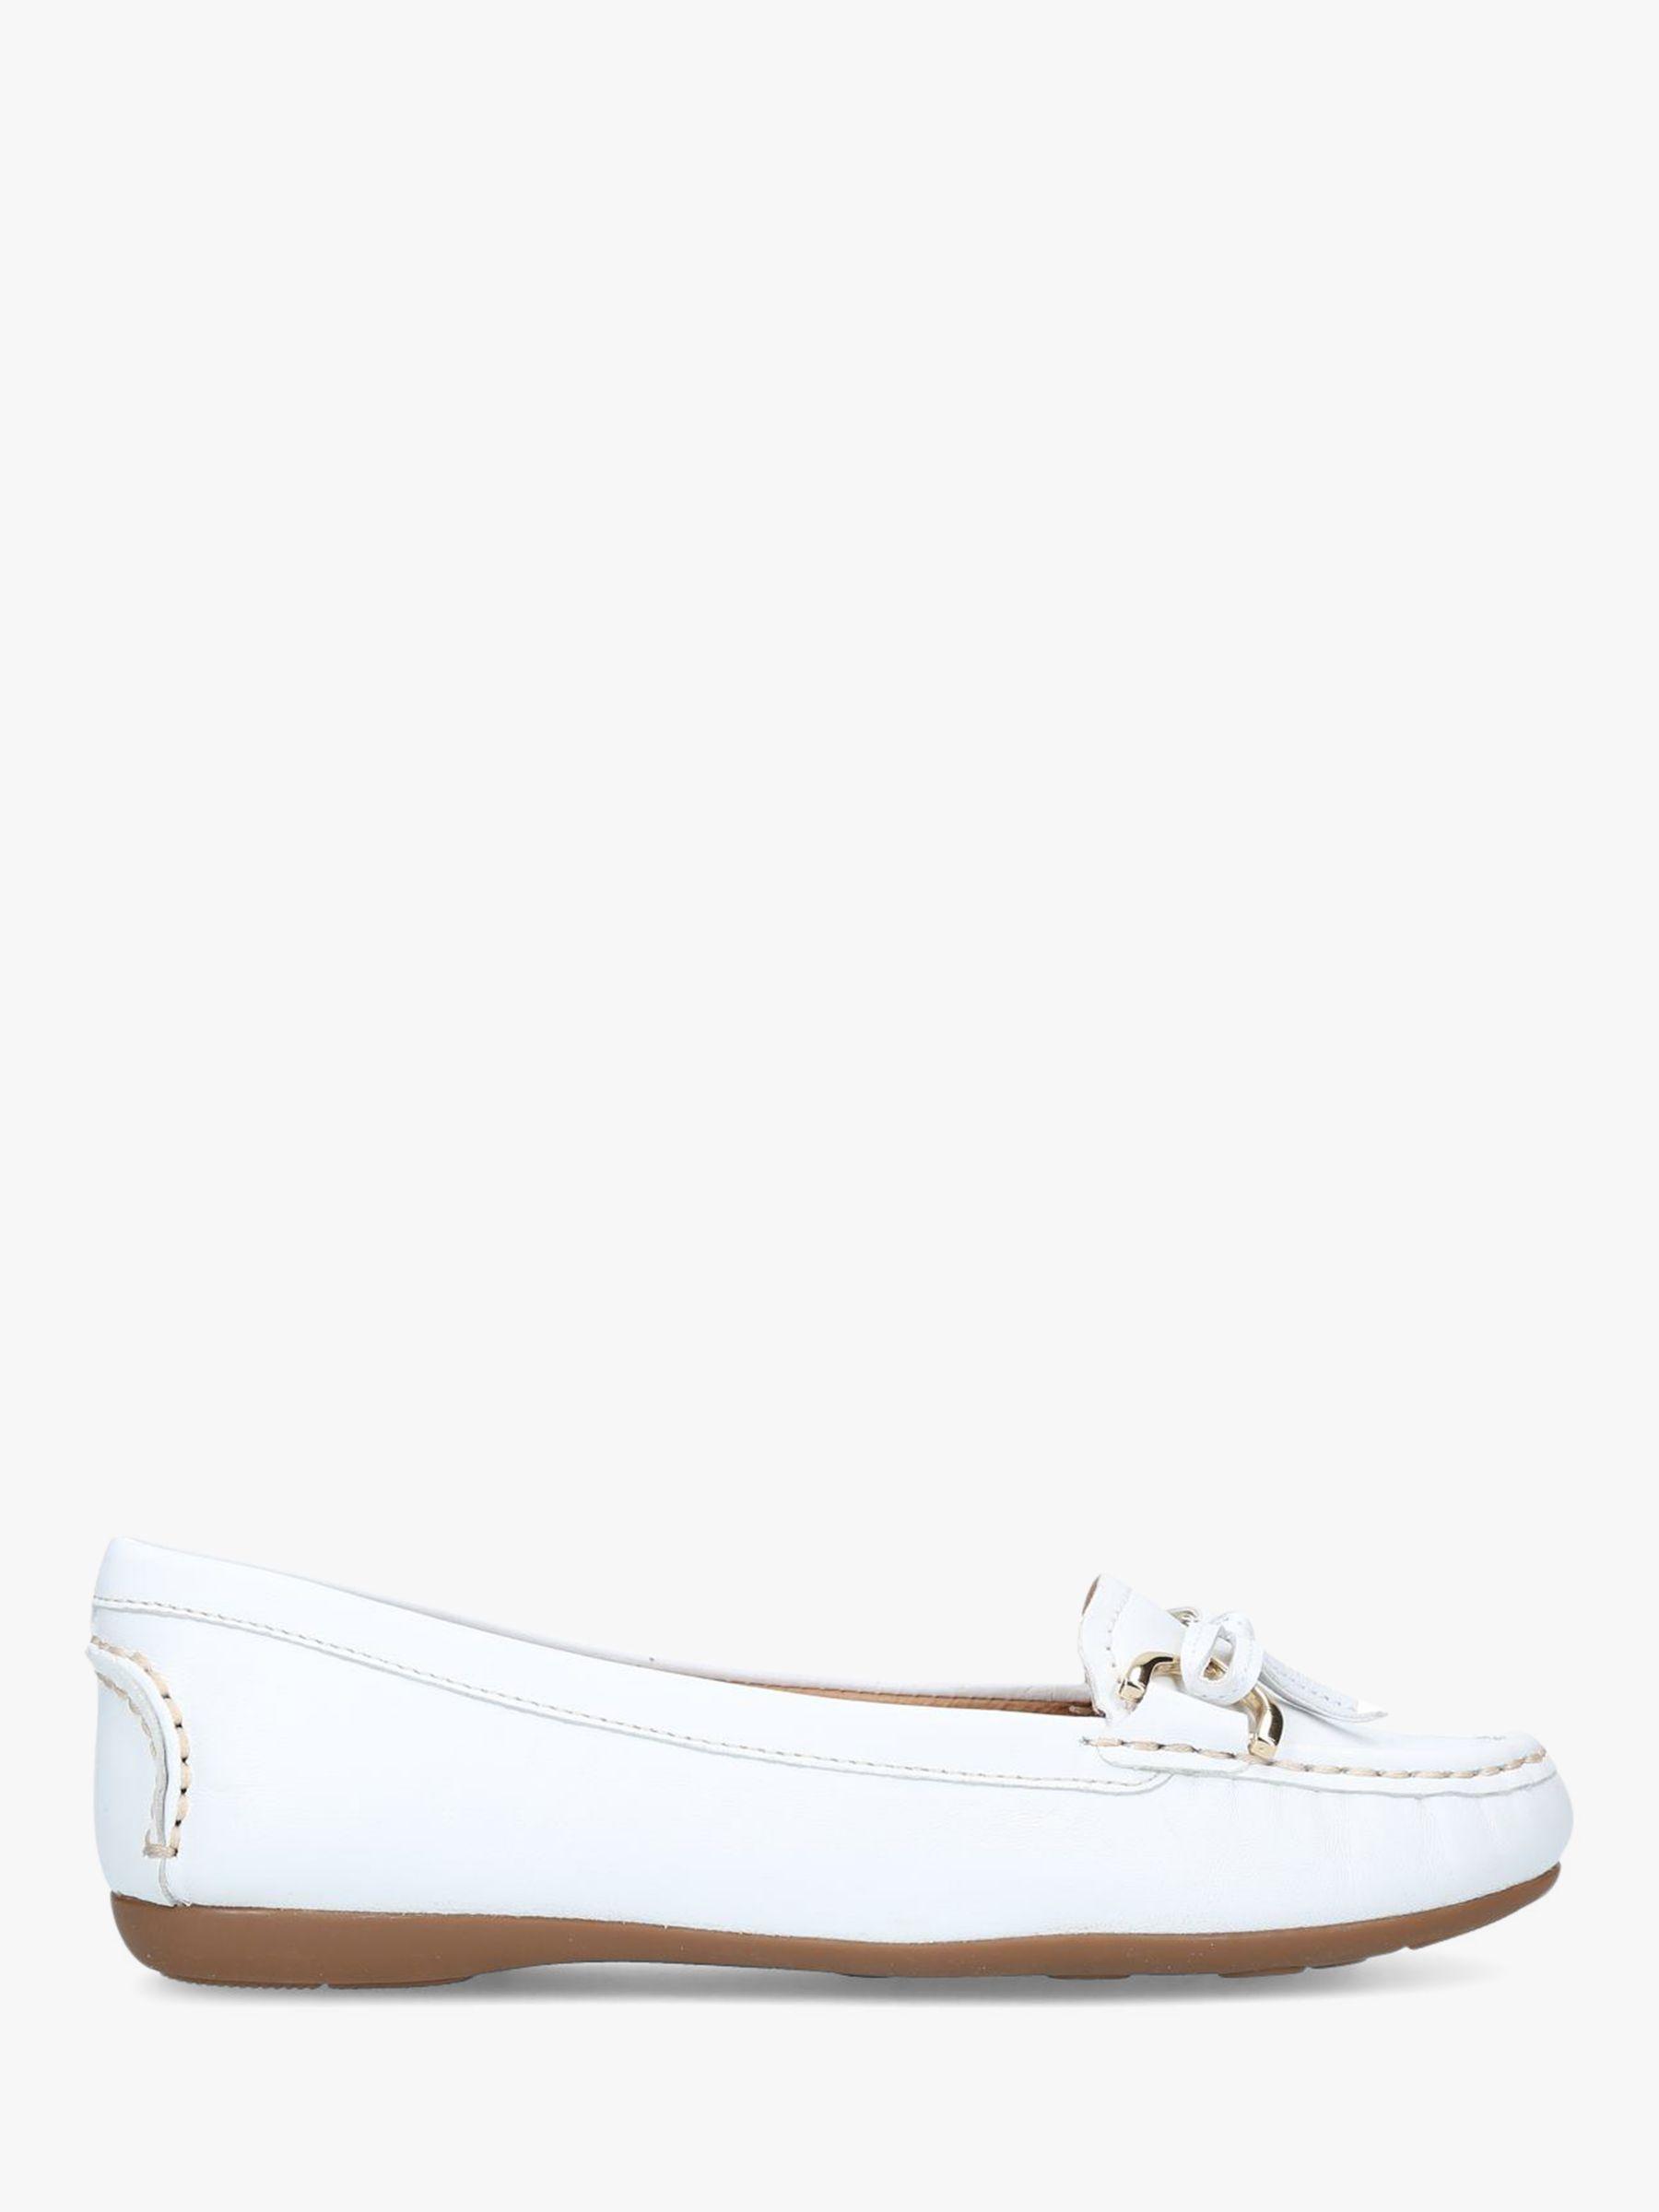 Carvela Comfort Carvela Comfort Cally Bow Loafers